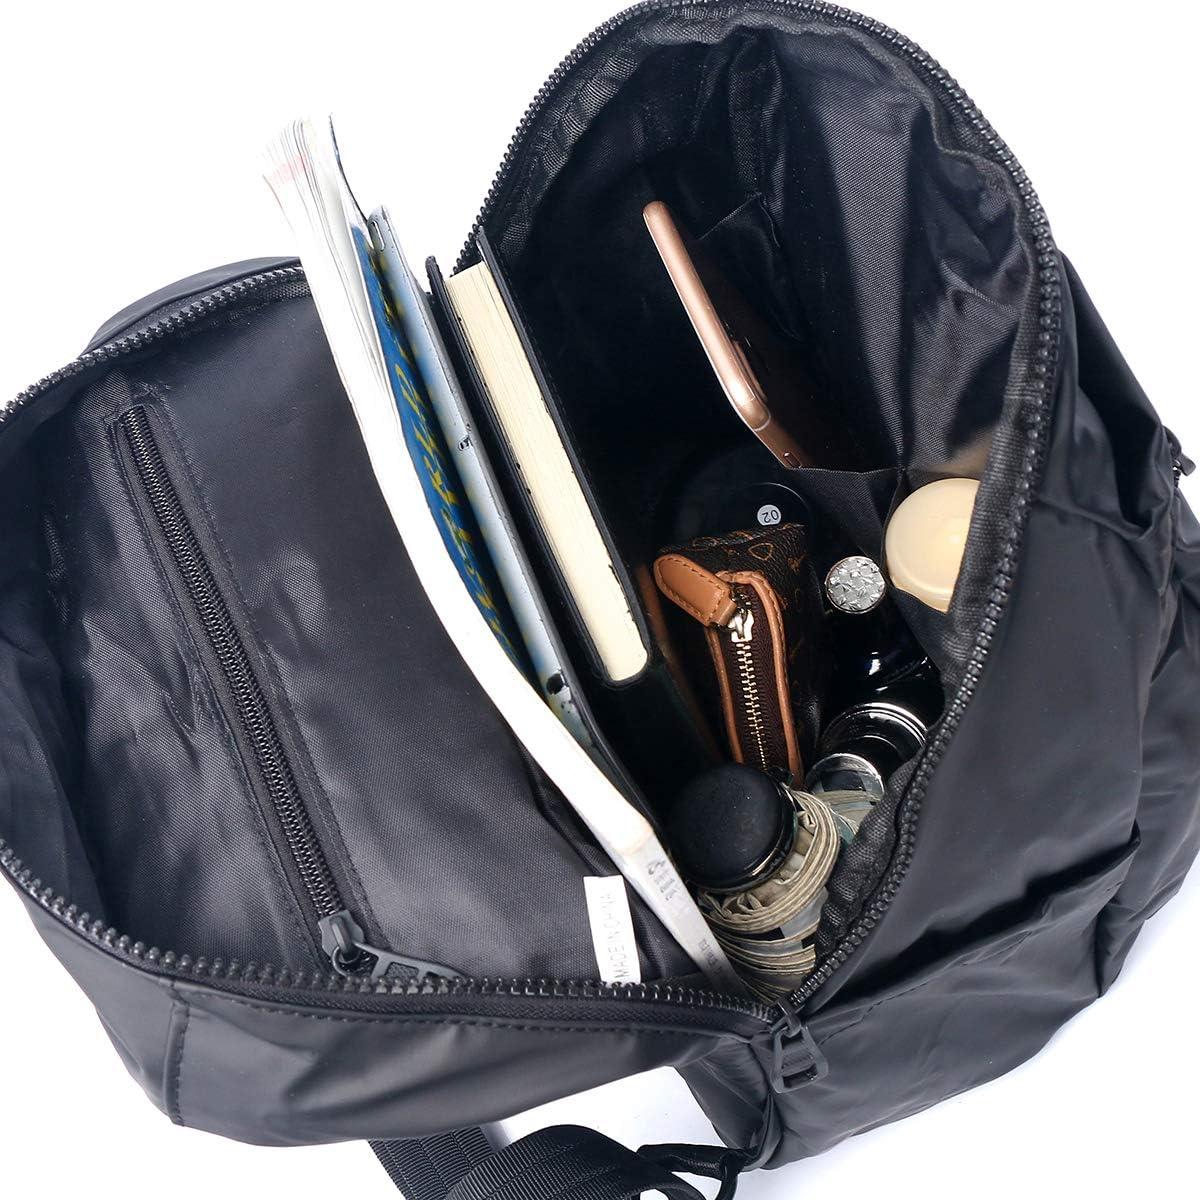 Zg Lightweight Waterproof Casual Fashion Backpack Shoulder Bag Travel Bag for Women and Girls